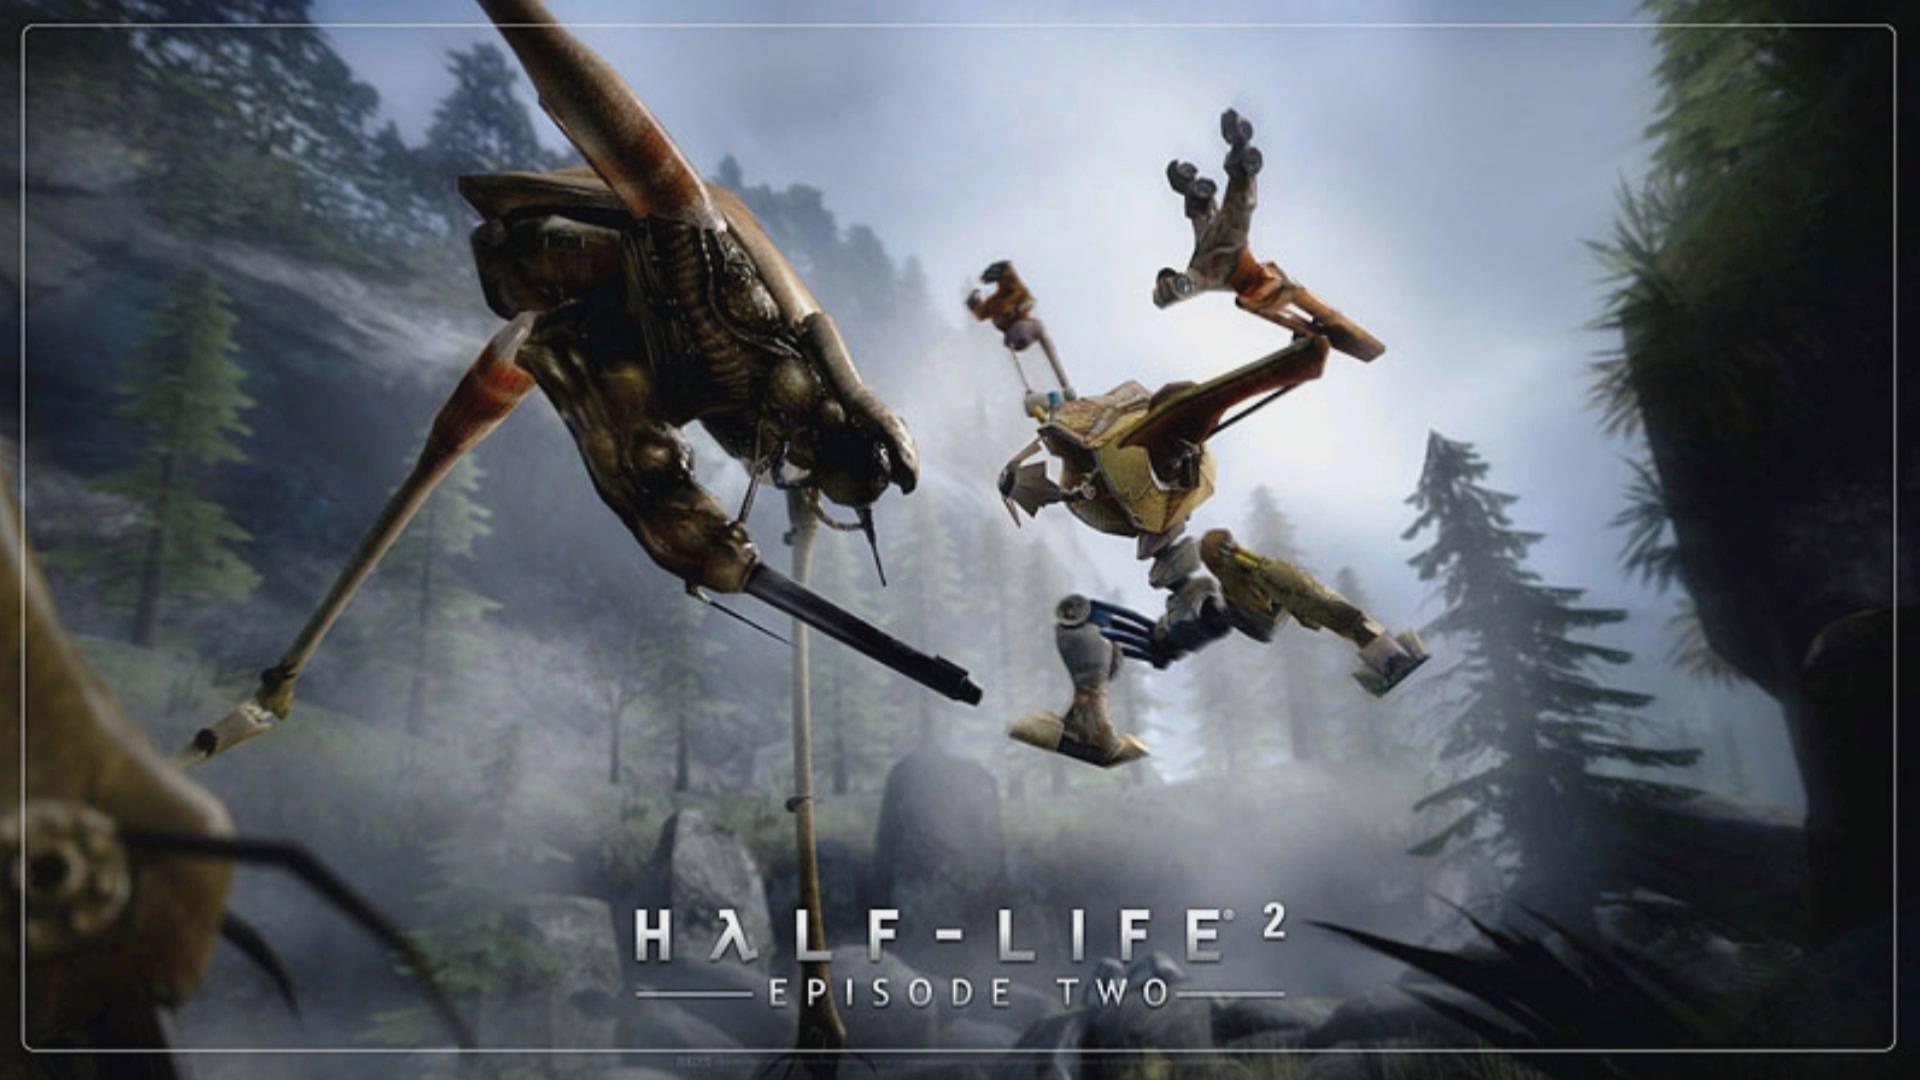 47 472476 half life 2 wallpapers for desktop half life